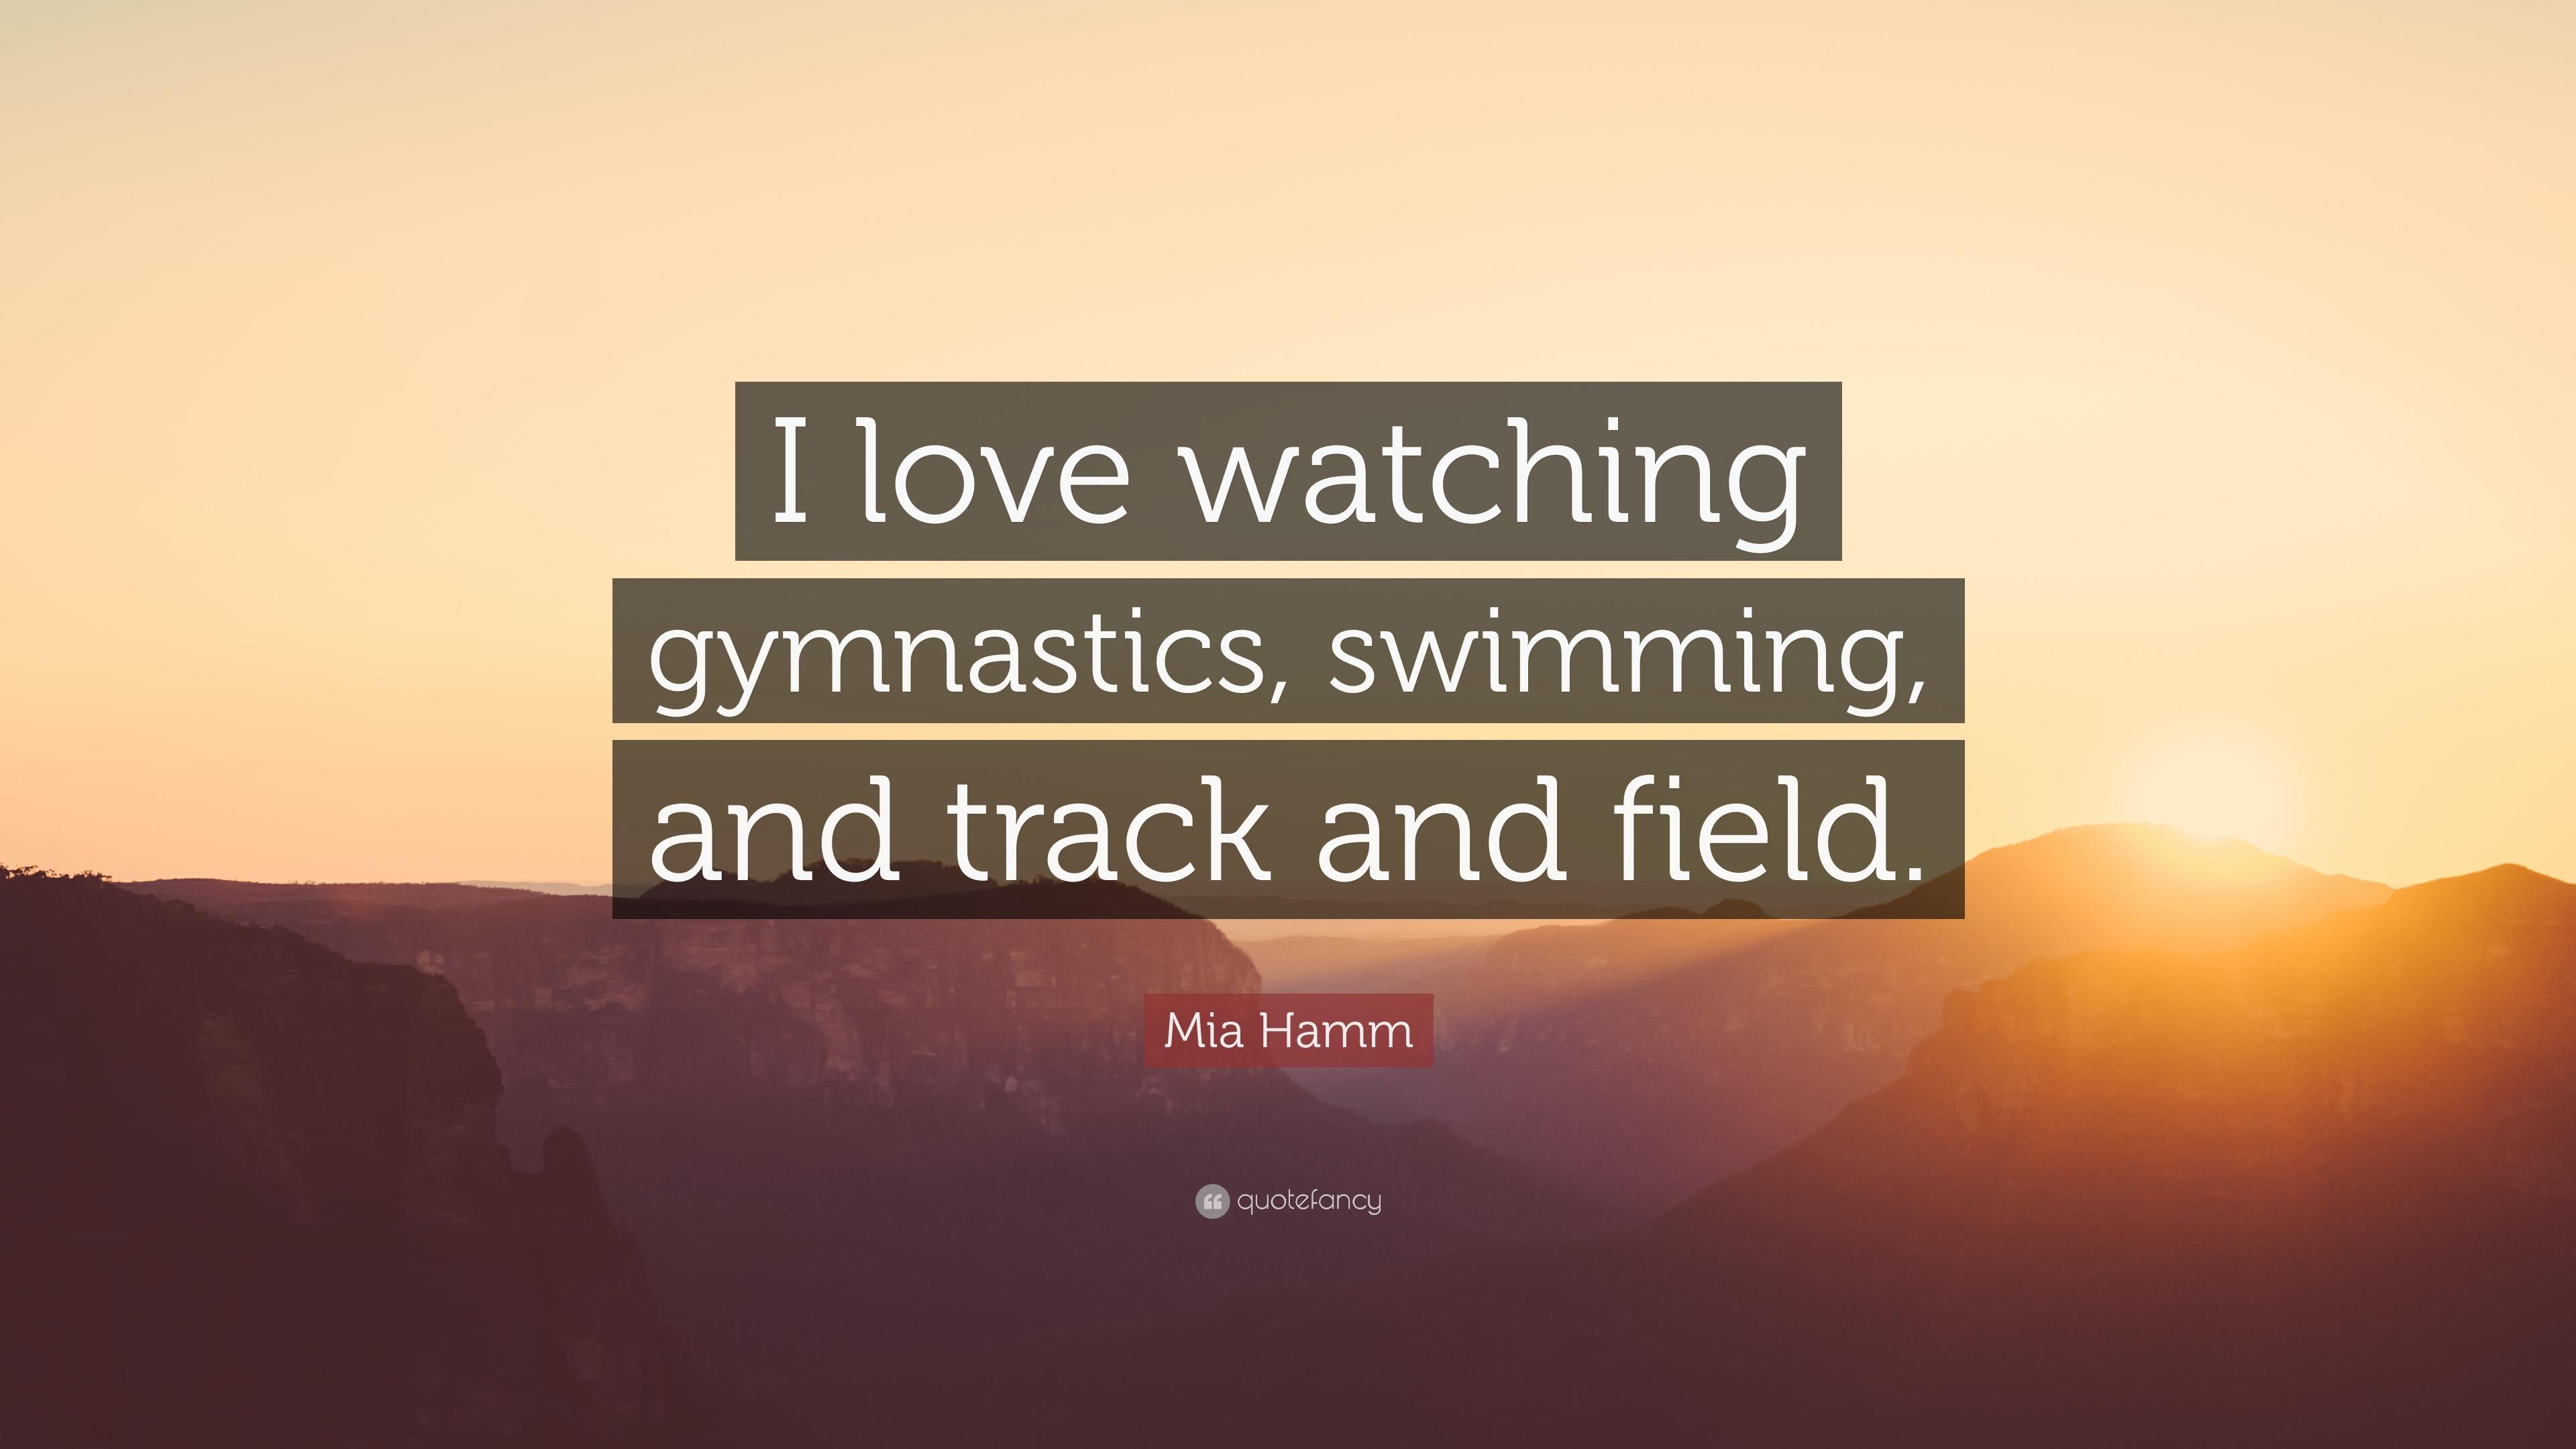 7 Wallpapers Mia Hamm Quote I Love Watching Gymnastics